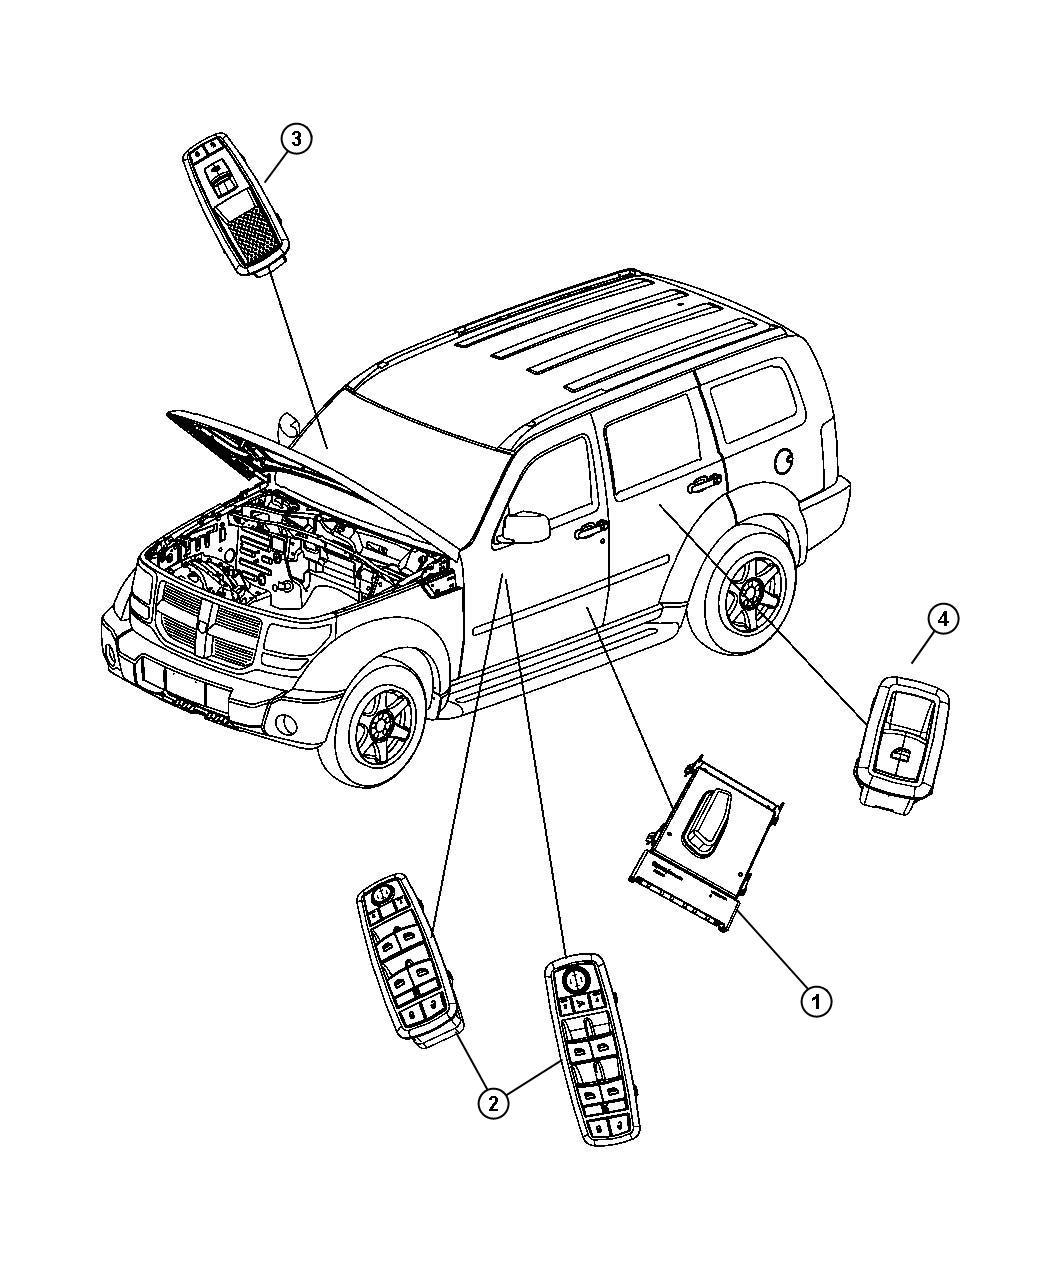 tags: #1990 chevy silverado wiring diagram#1990 chevy suburban wiring  diagram#ford 3g alternator wiring diagram#1990 chevy blazer wiring diagram#1994  chevy